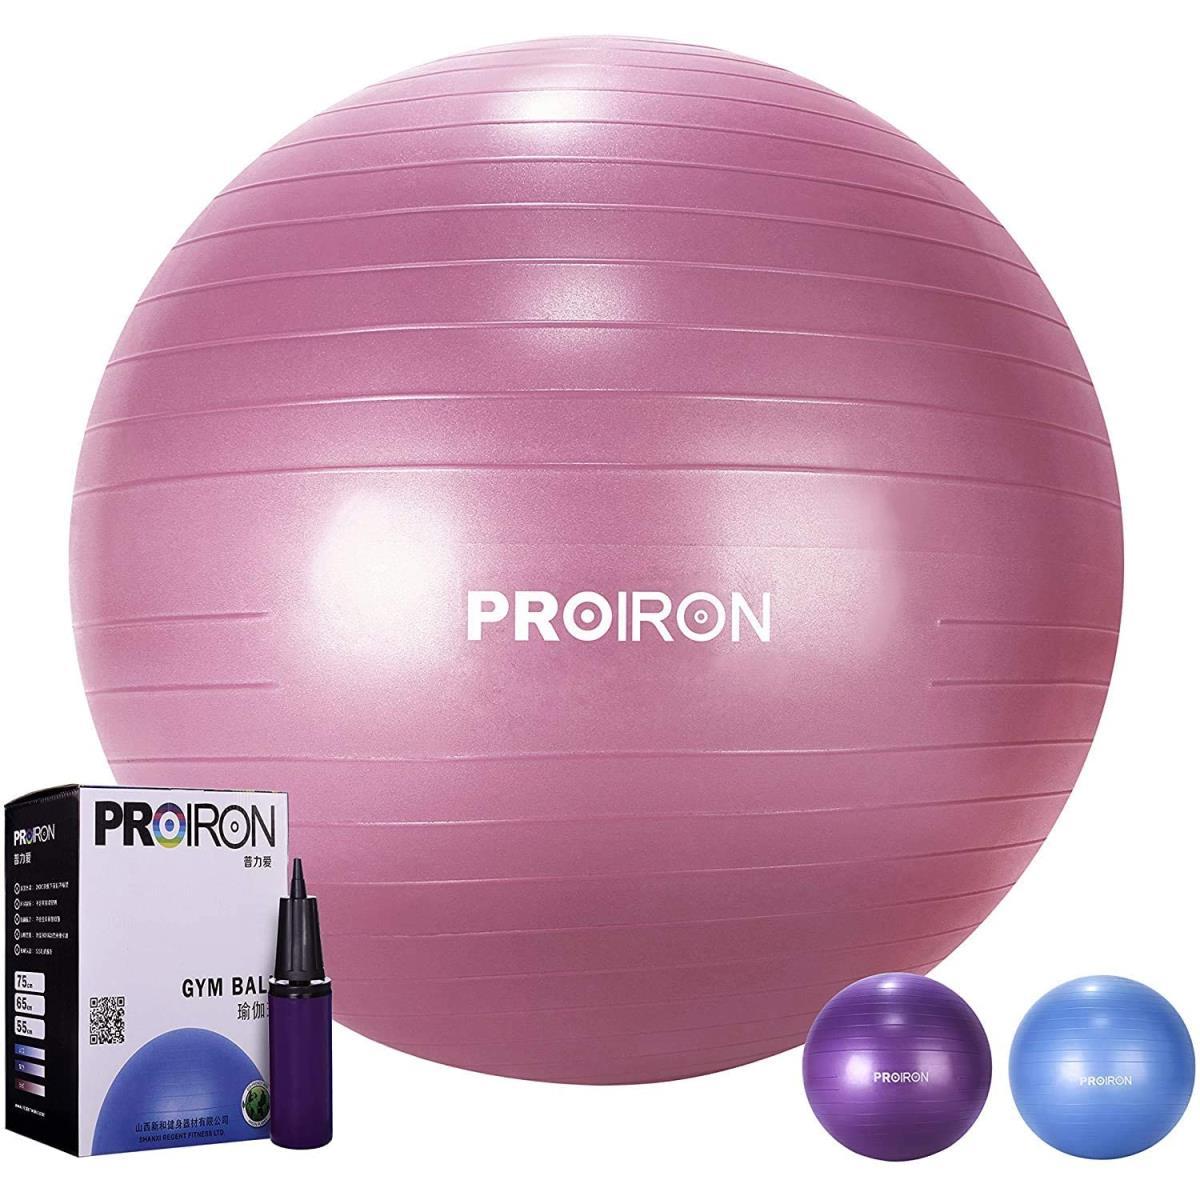 PROIRON Gymnastikball Ø65cm mit Pumpe Übung Yoga Balance Ball Pezziball Sitzball,PROIRON,PRO-YJ01-6, 6942590001125